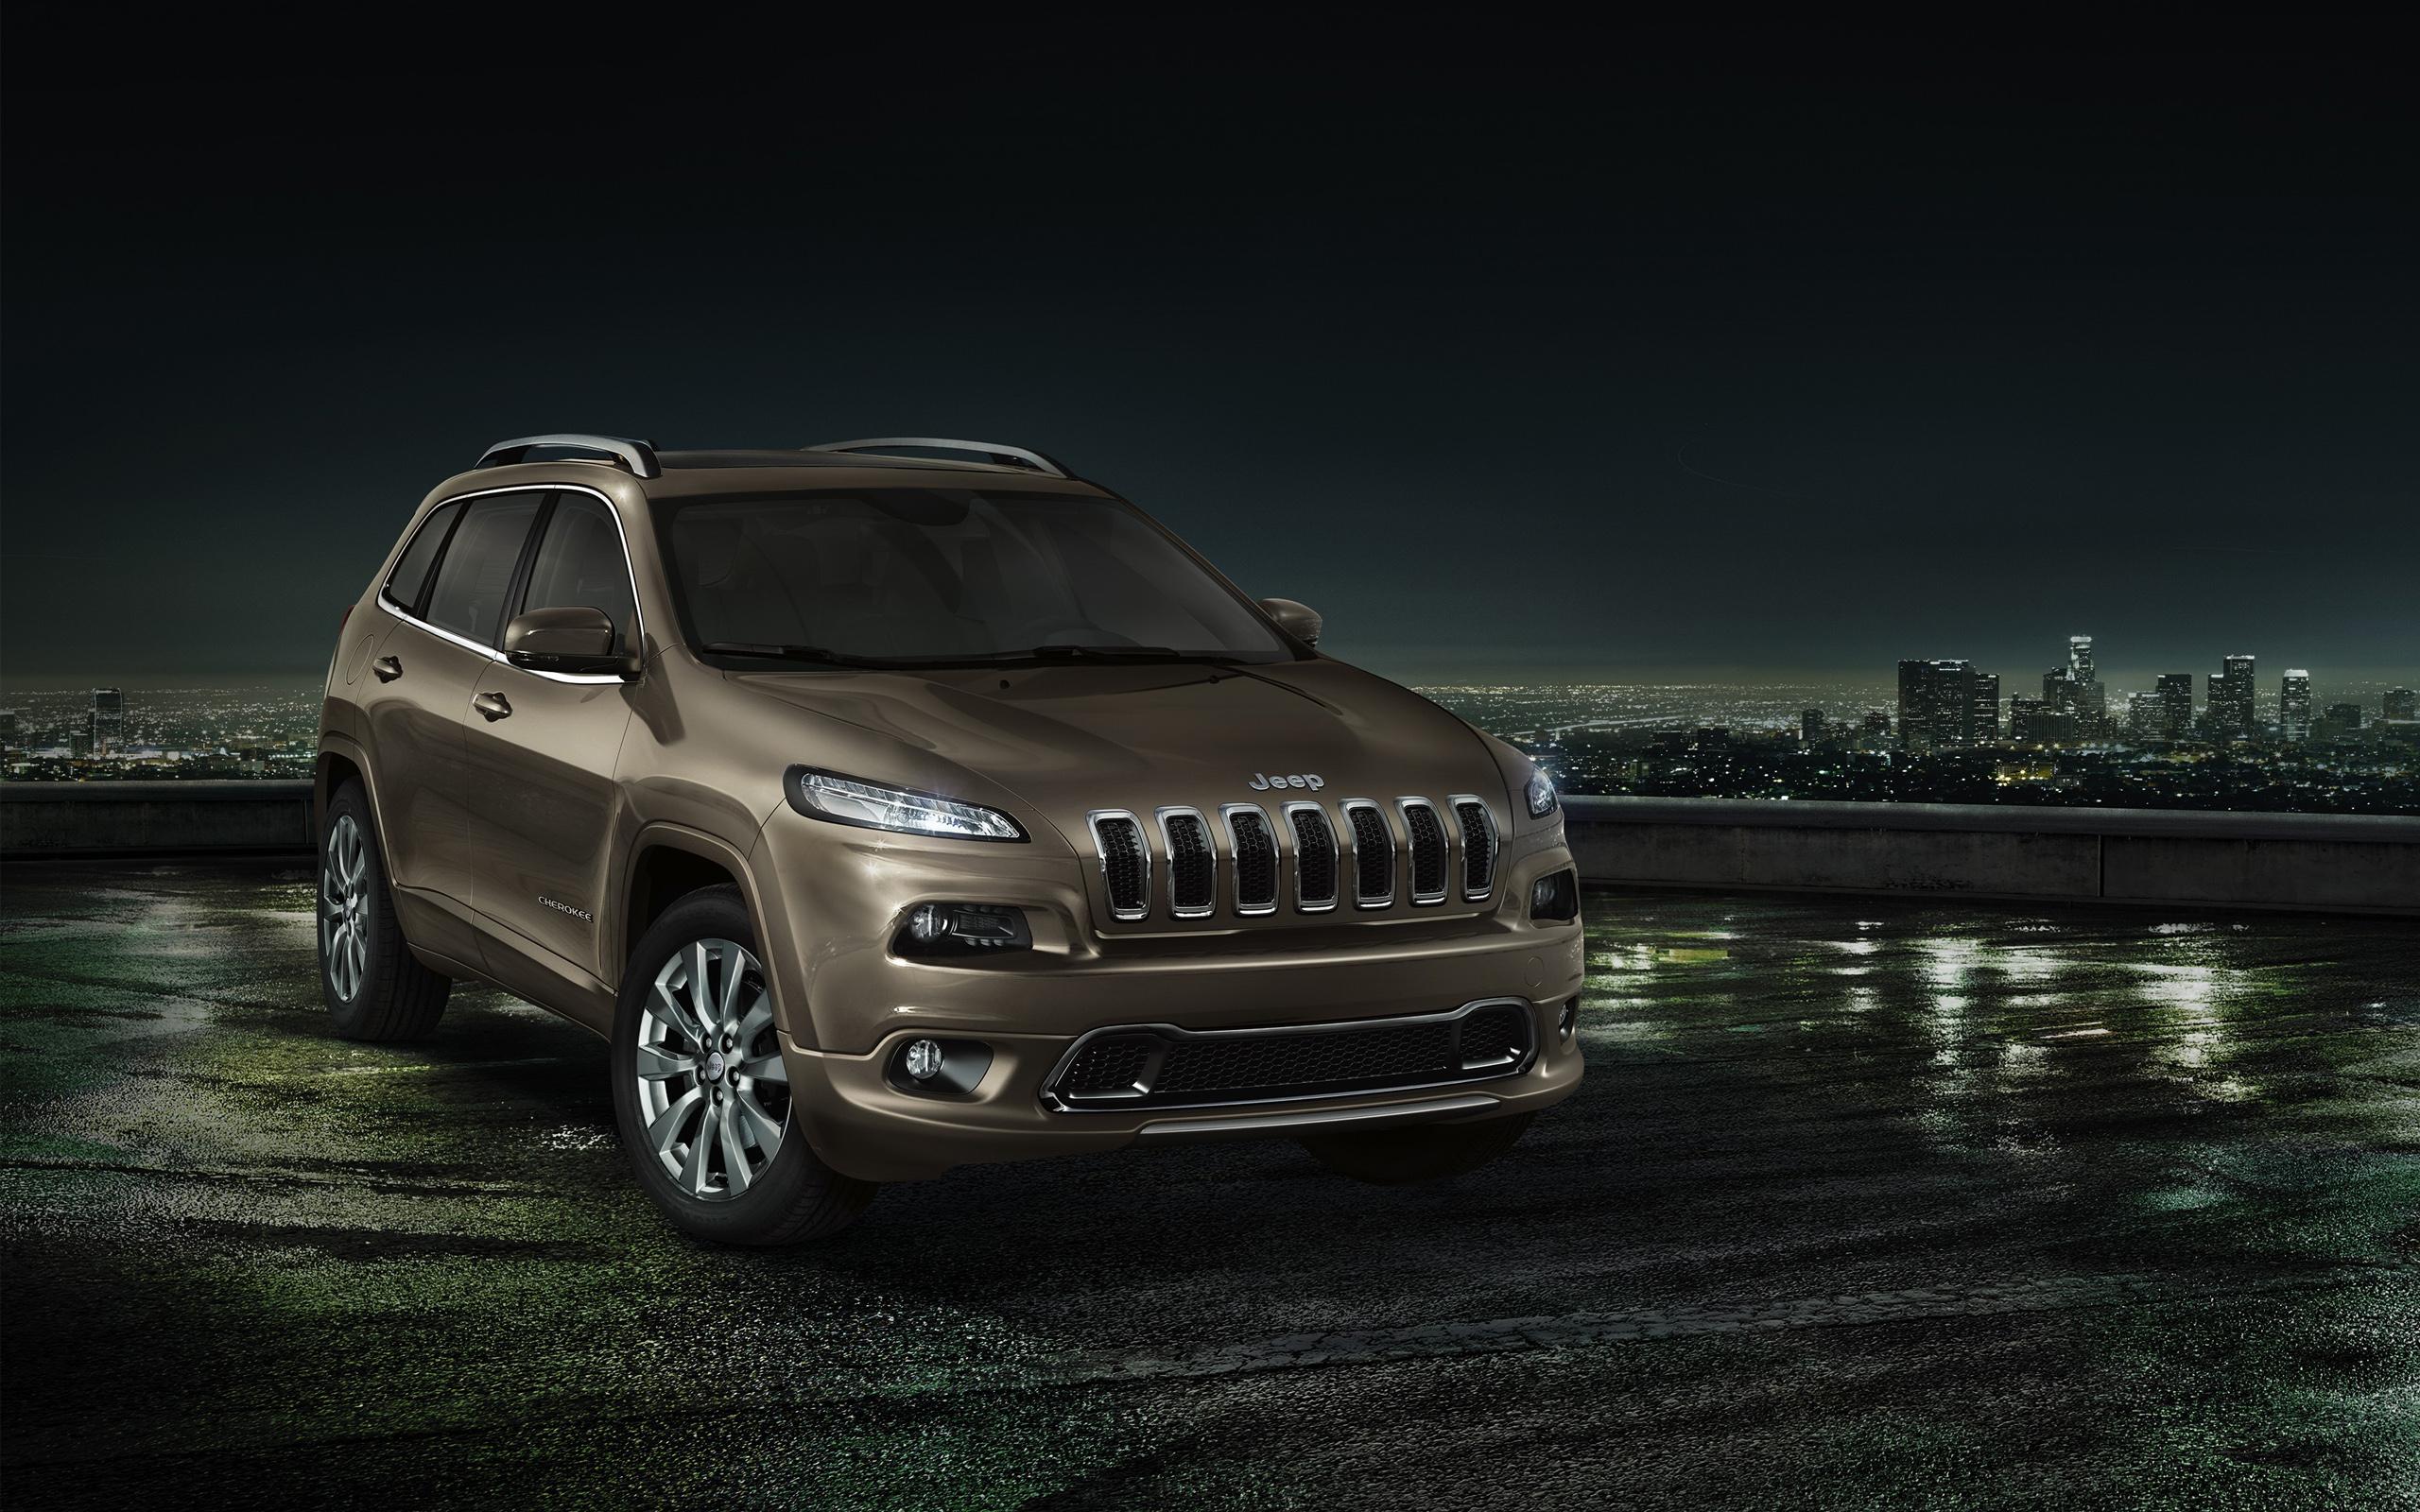 2017 Jeep Grand Cherokee Wallpaper HD Car Wallpapers